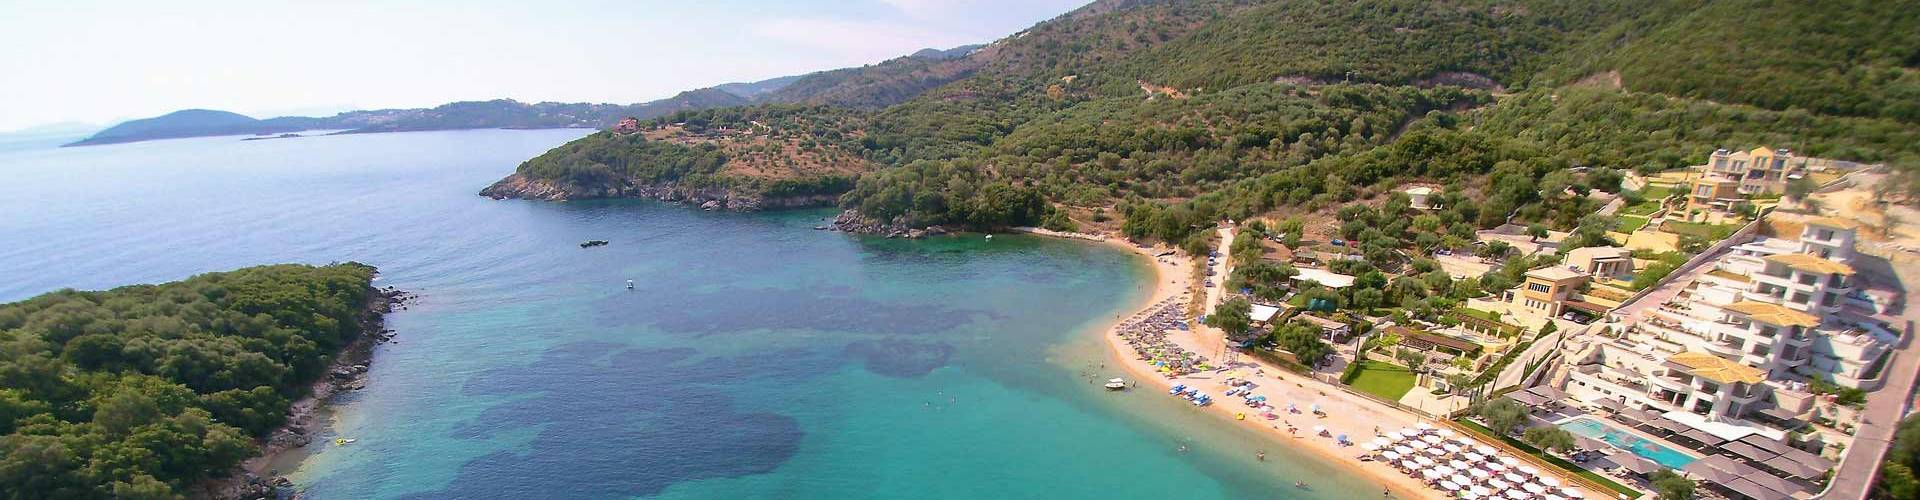 Plaže na Agia Paraskevi